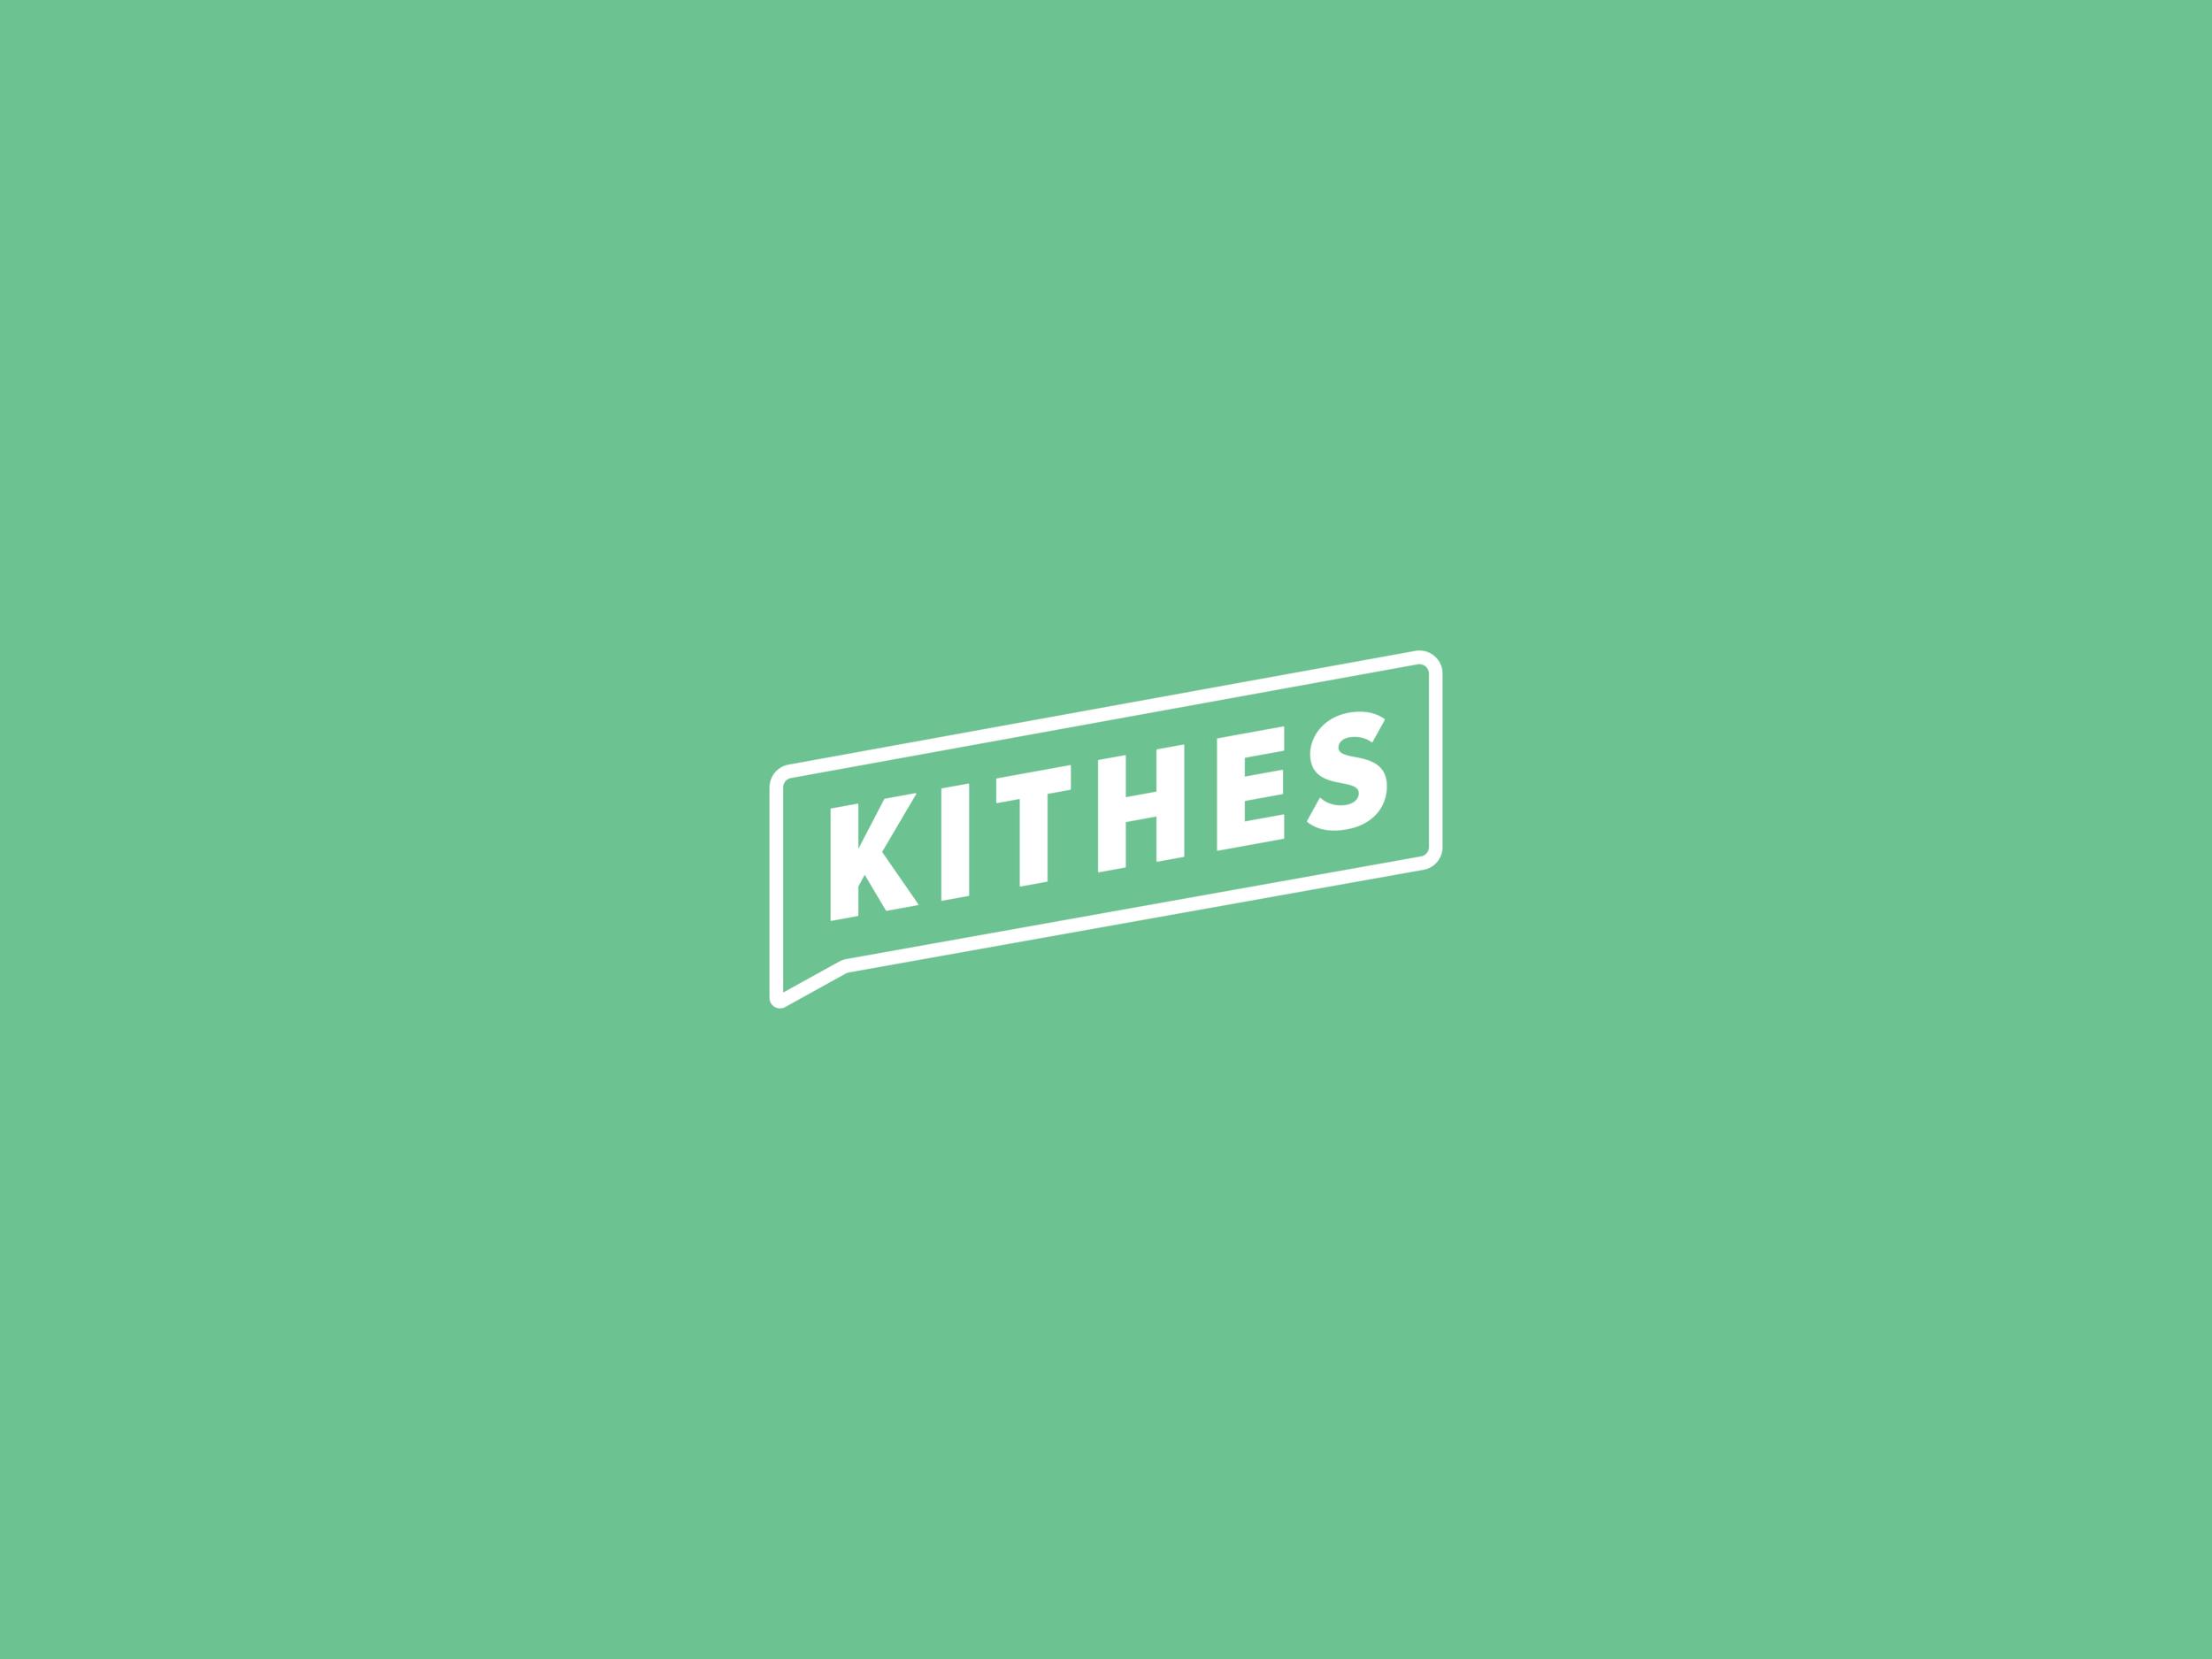 Logo Design For Alex Kithes Campaign 2019